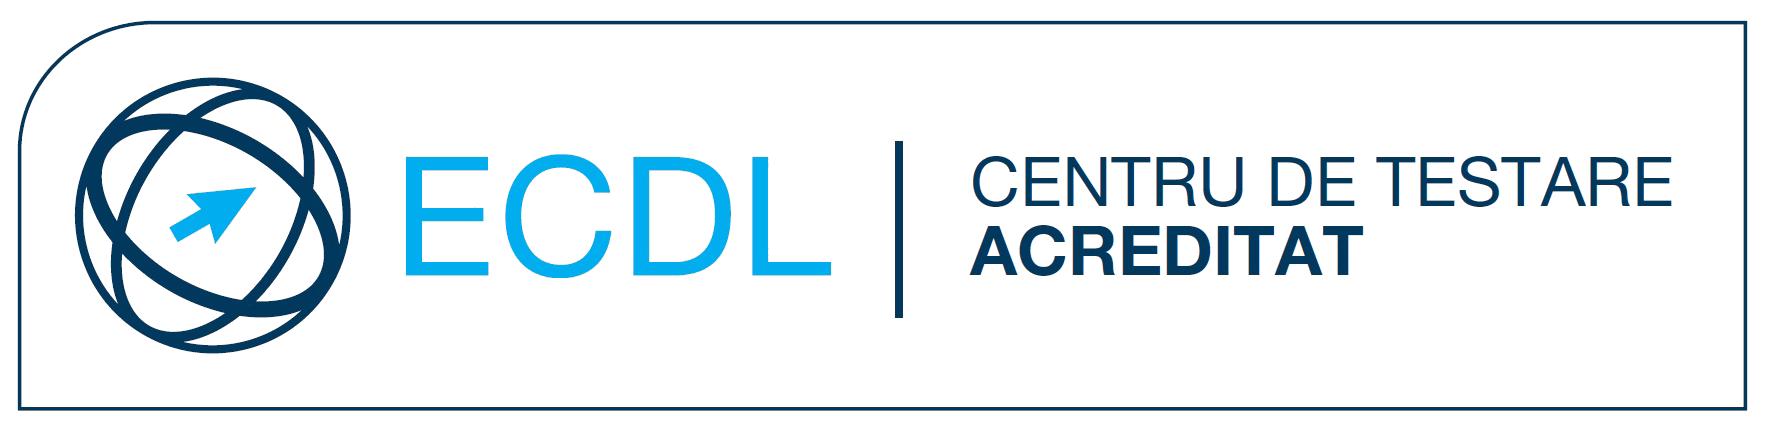 ecdl-testare-logo